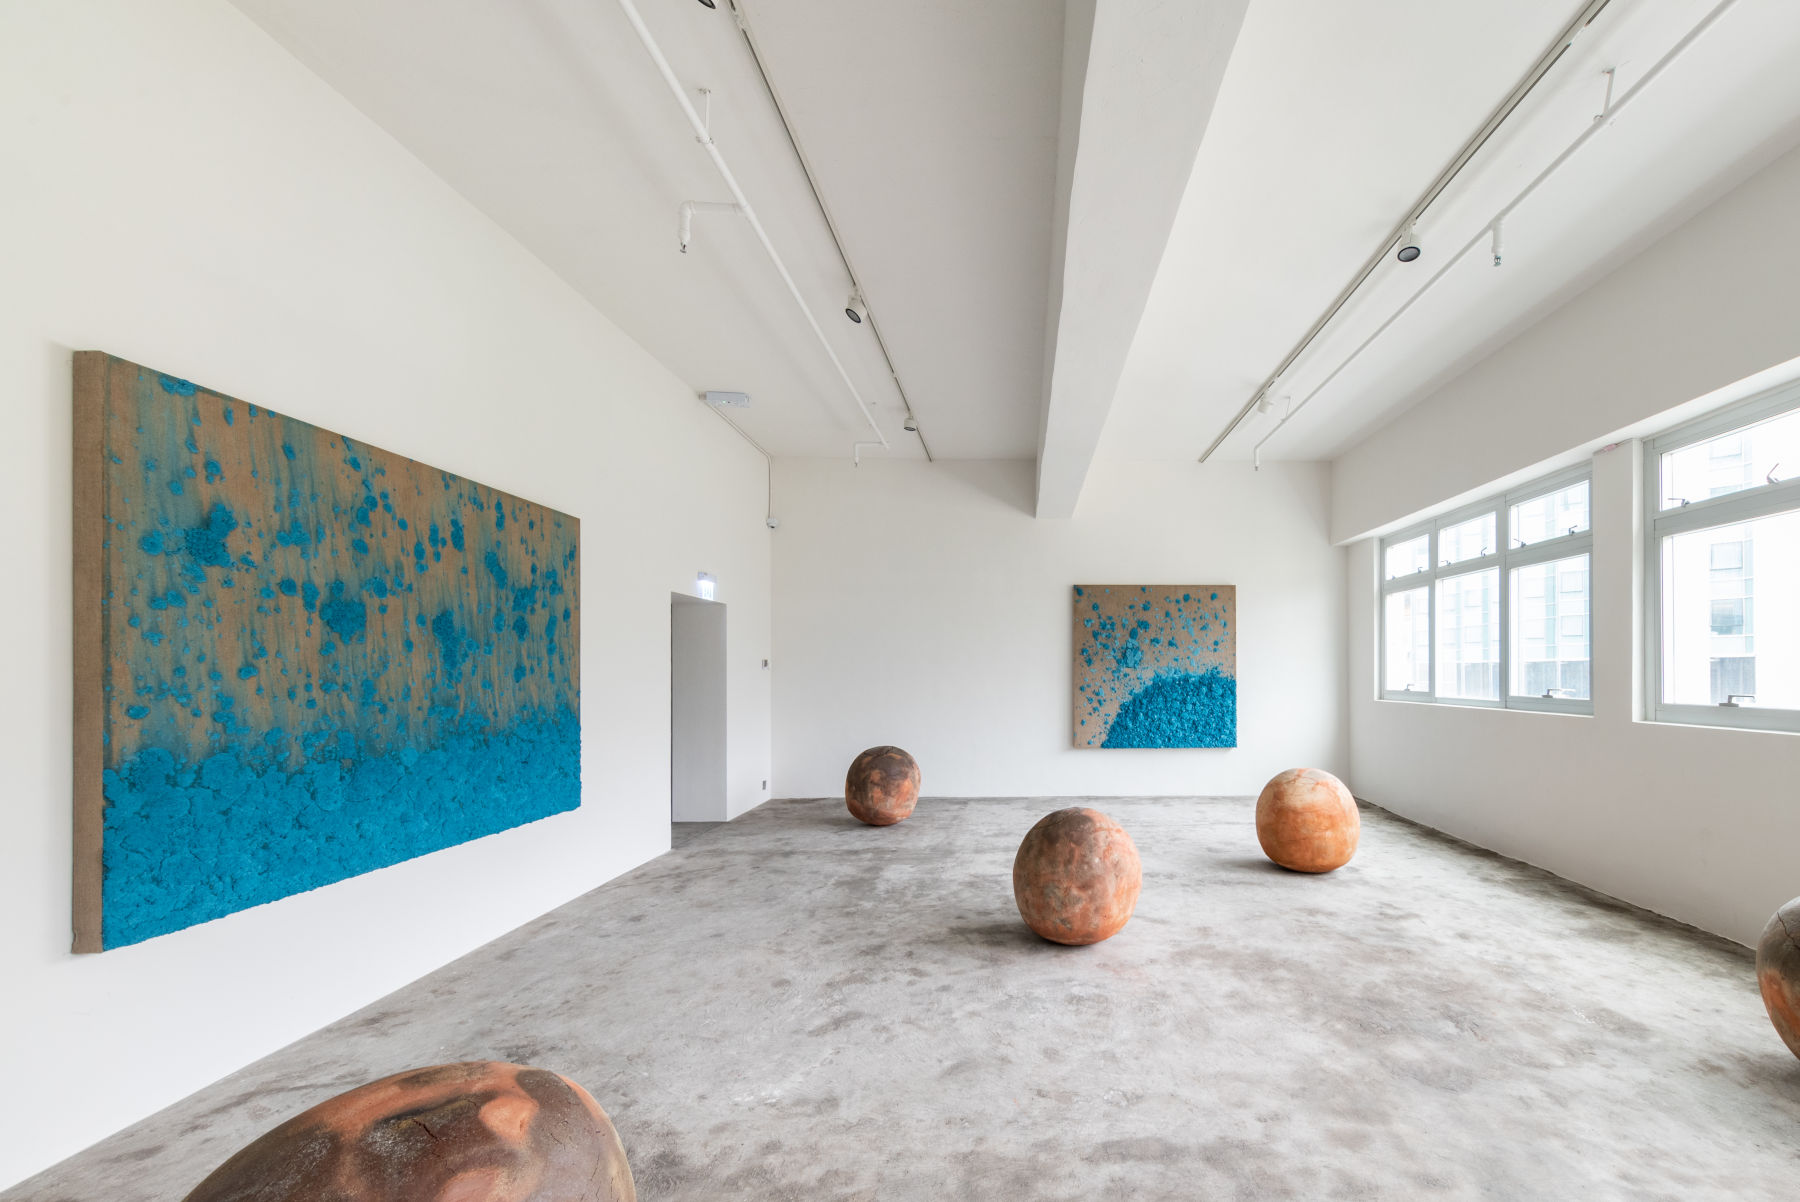 Axel Vervoordt Gallery Hong Kong Bosco Sodi 1